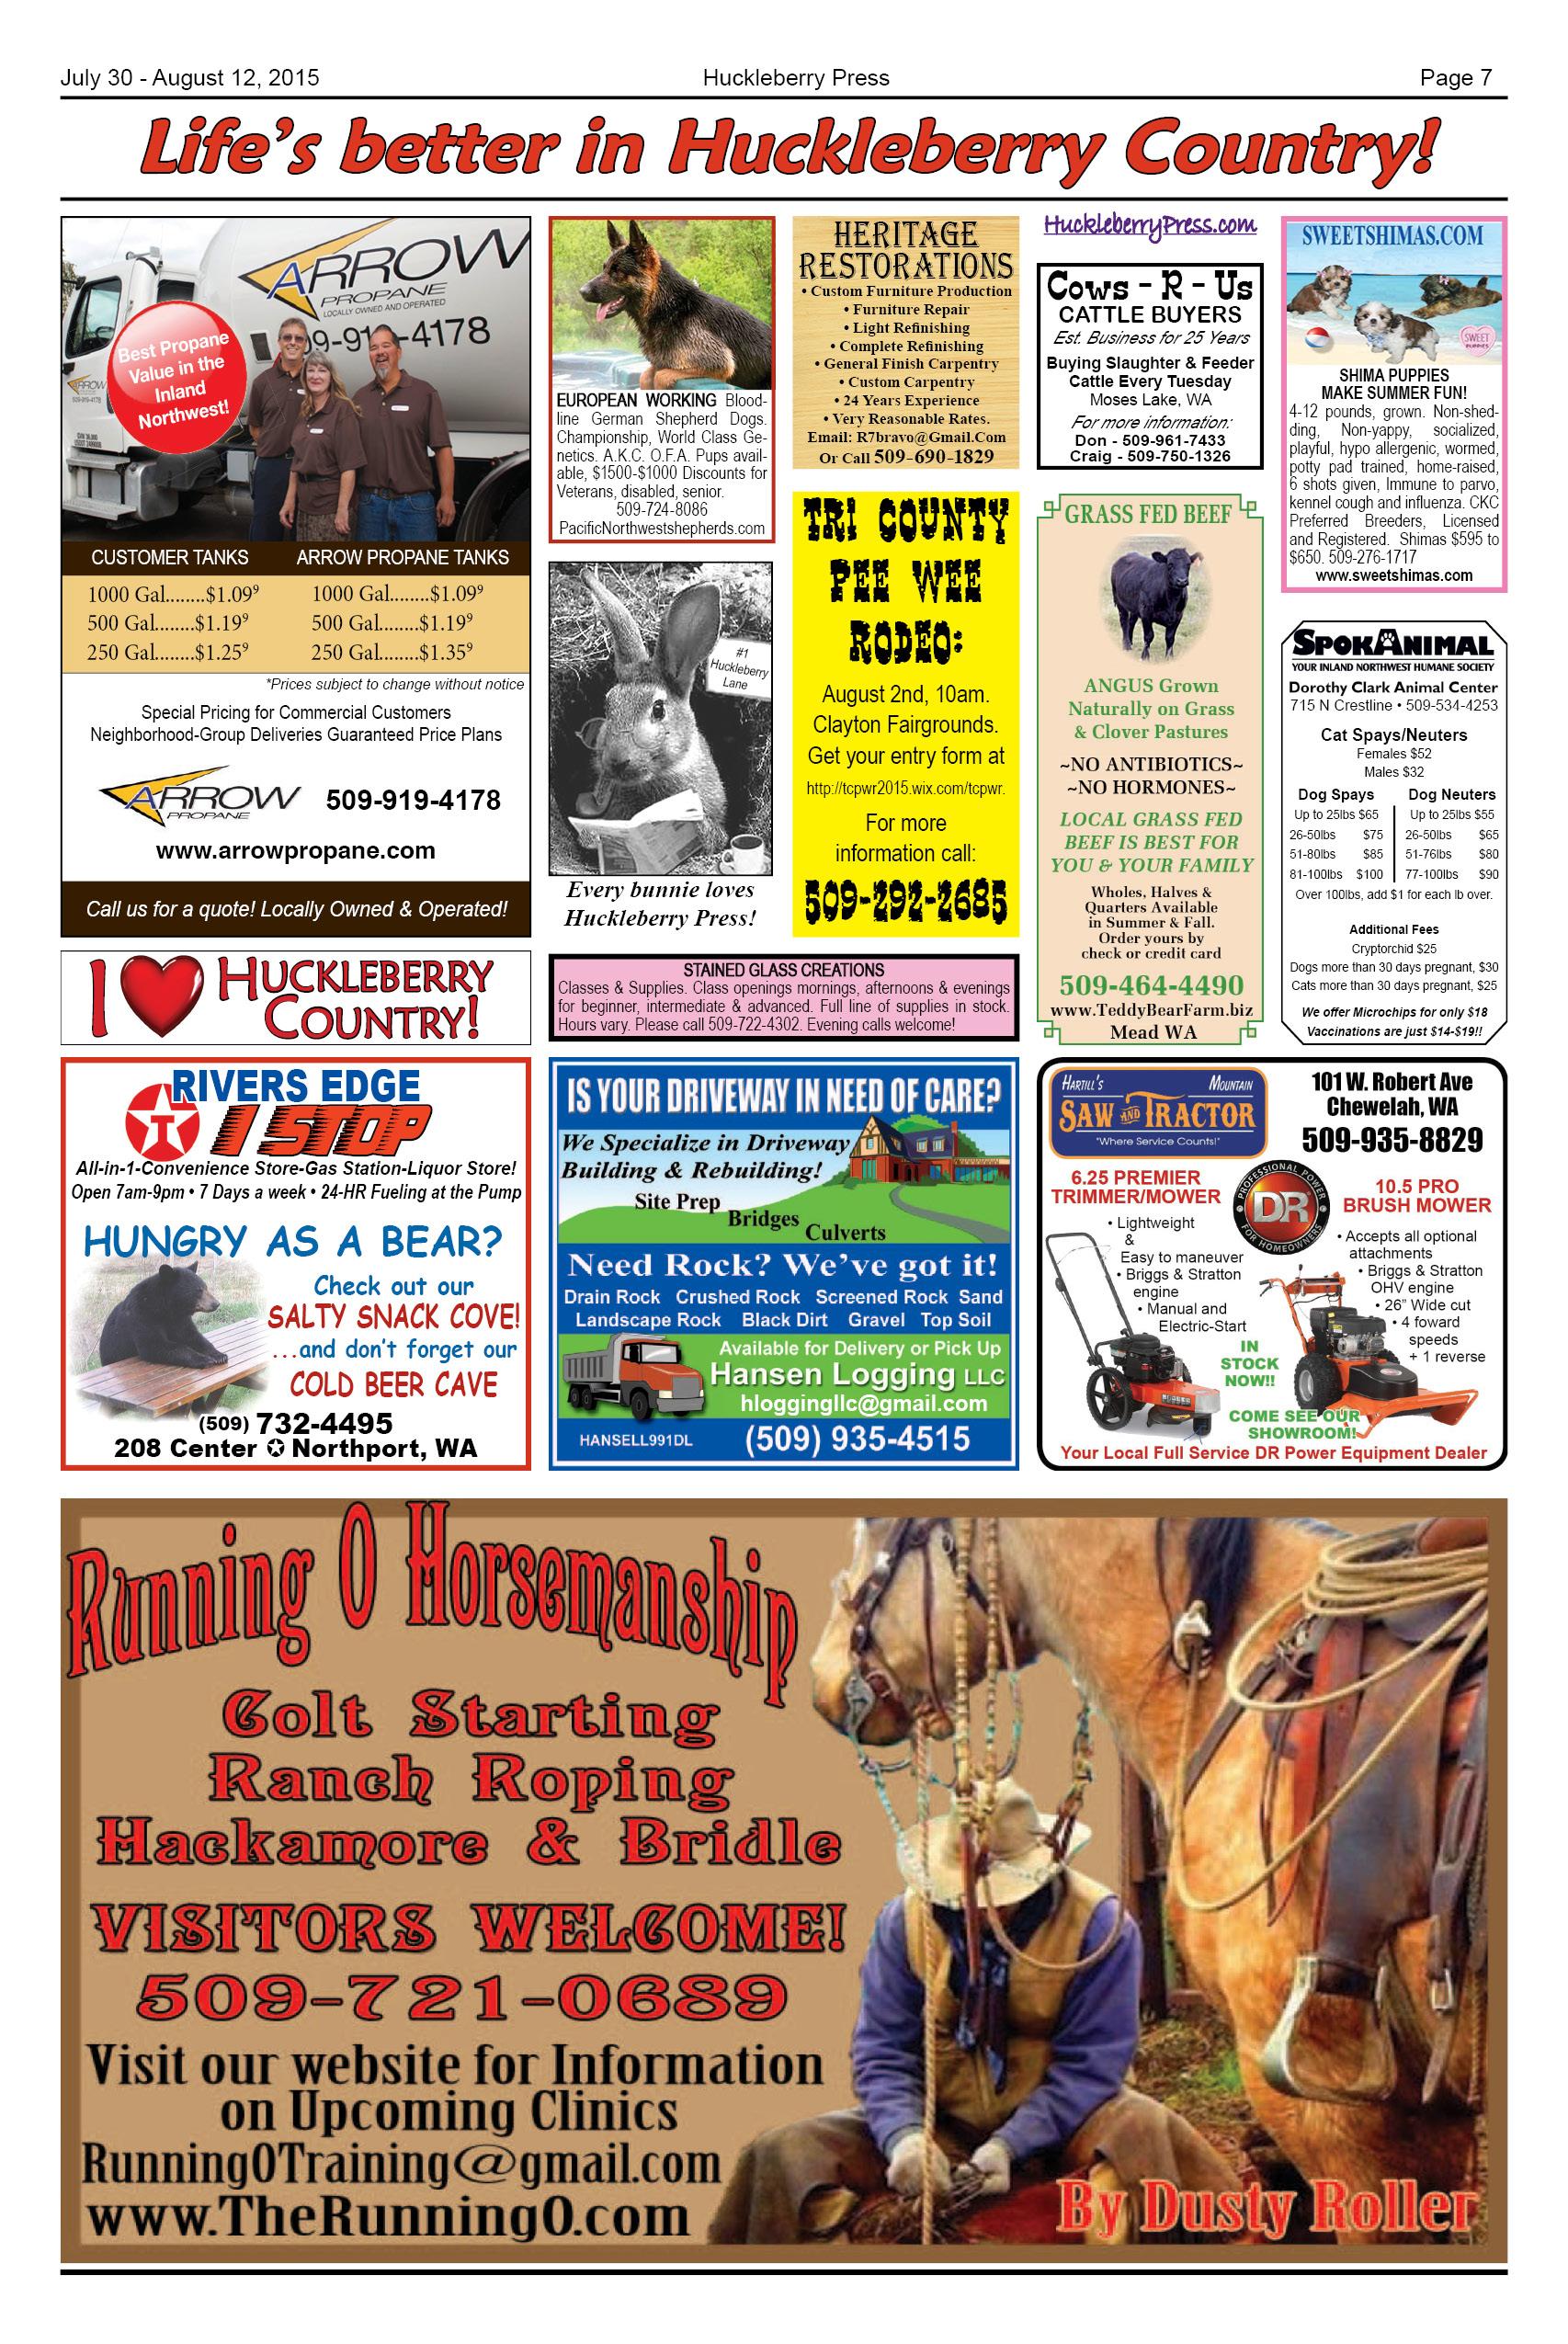 Huck_Press-2015-July_30-pg7